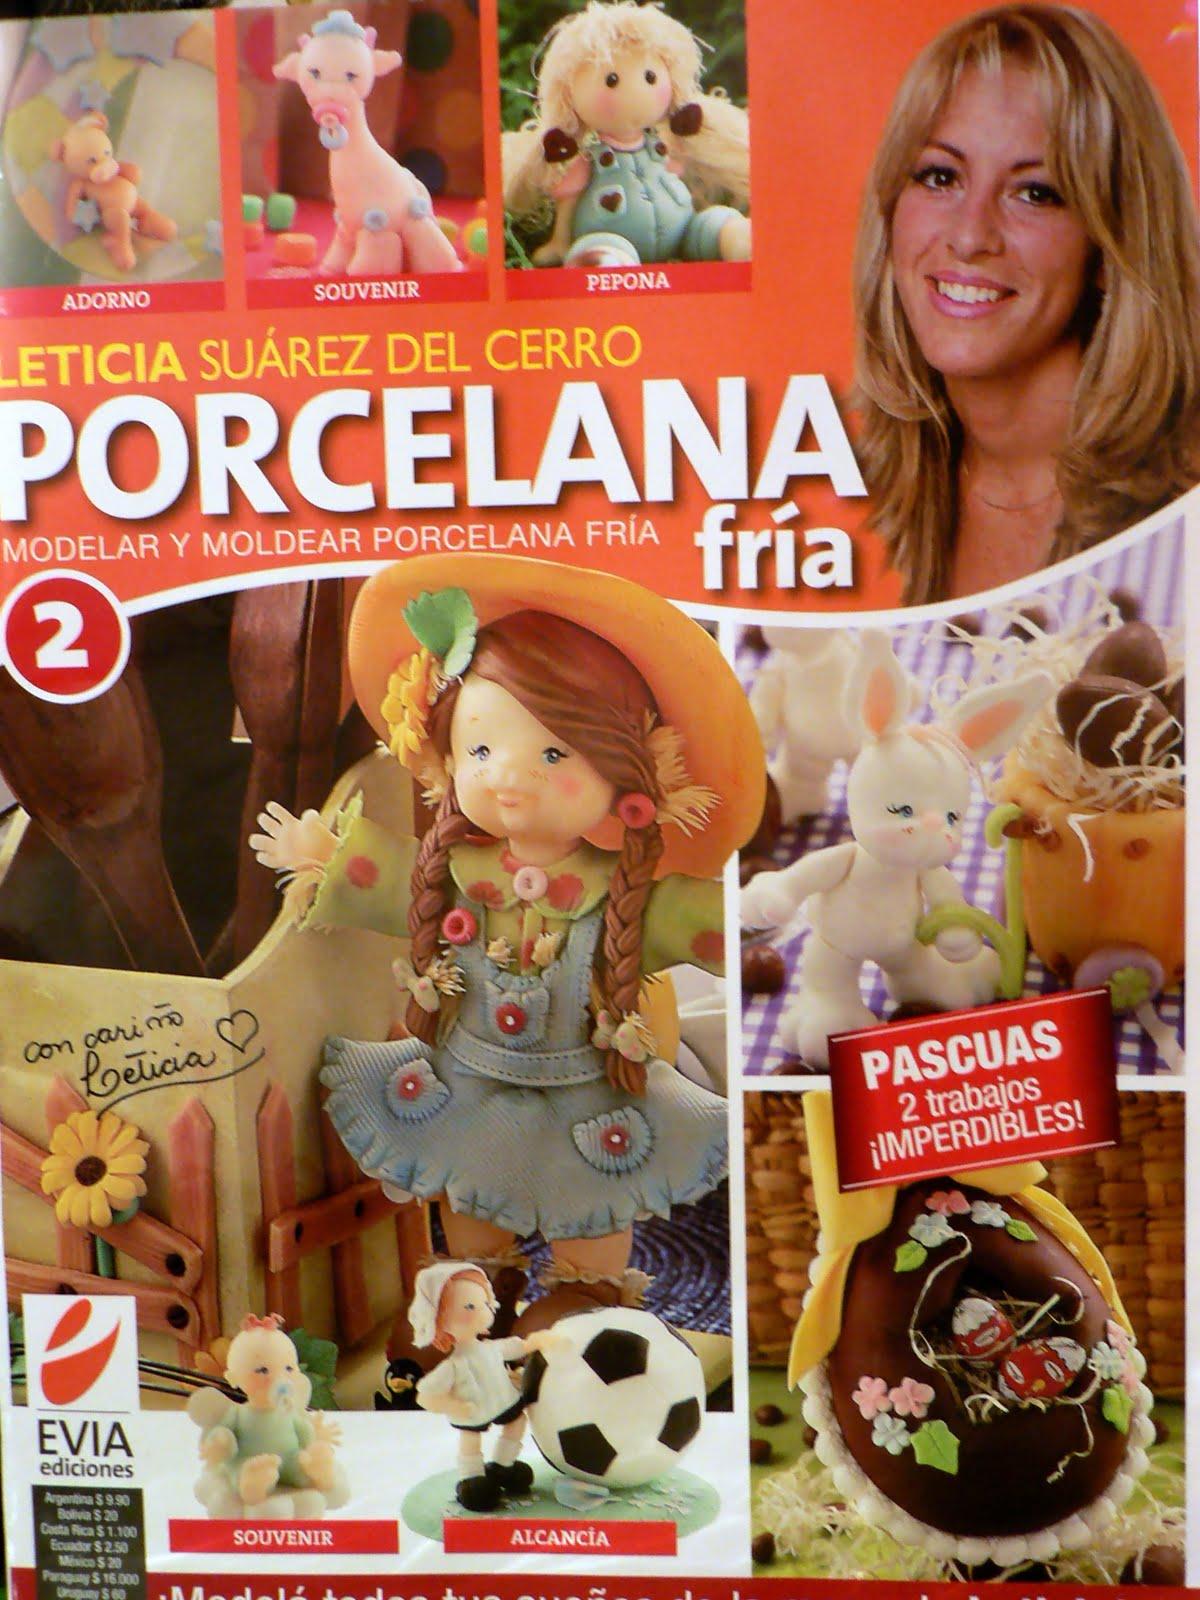 PORCELANA FRIA: Leticia Suarez del Cerro Nº2; Pepona,conejito, bebes